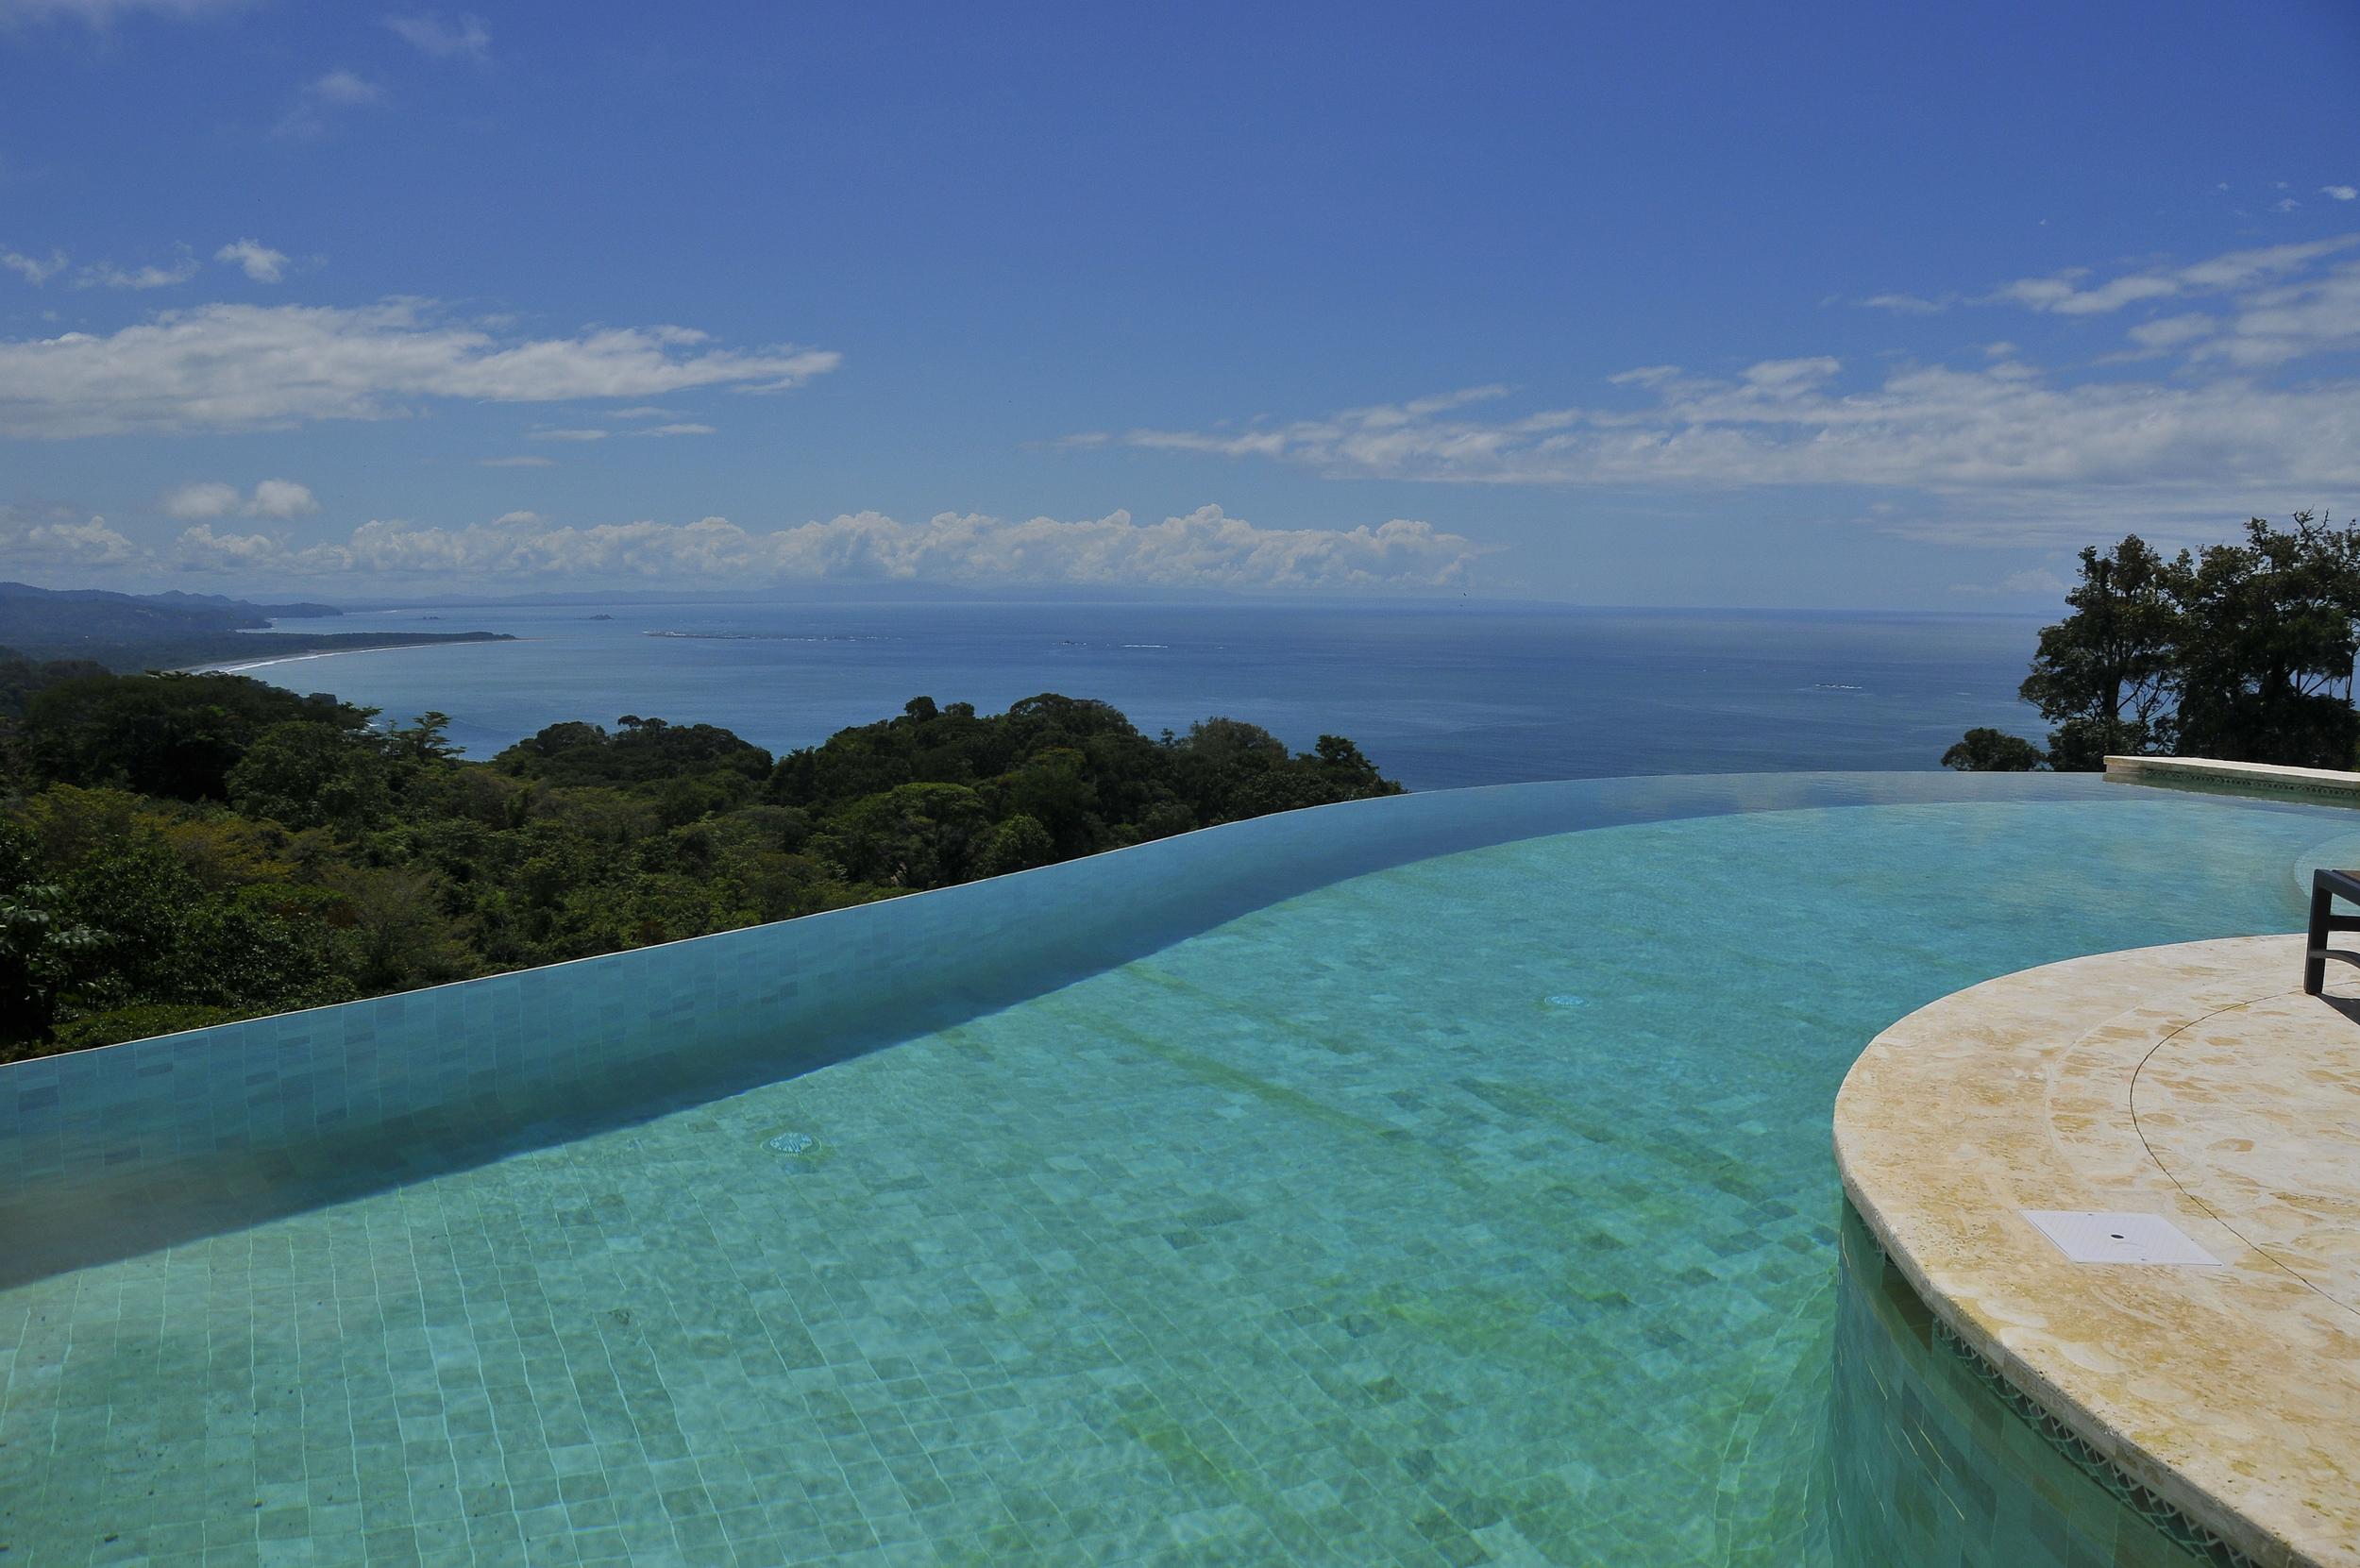 flex5-yoga-retreat-costa-rica-villa-infinity-pool-day-ocean.jpg